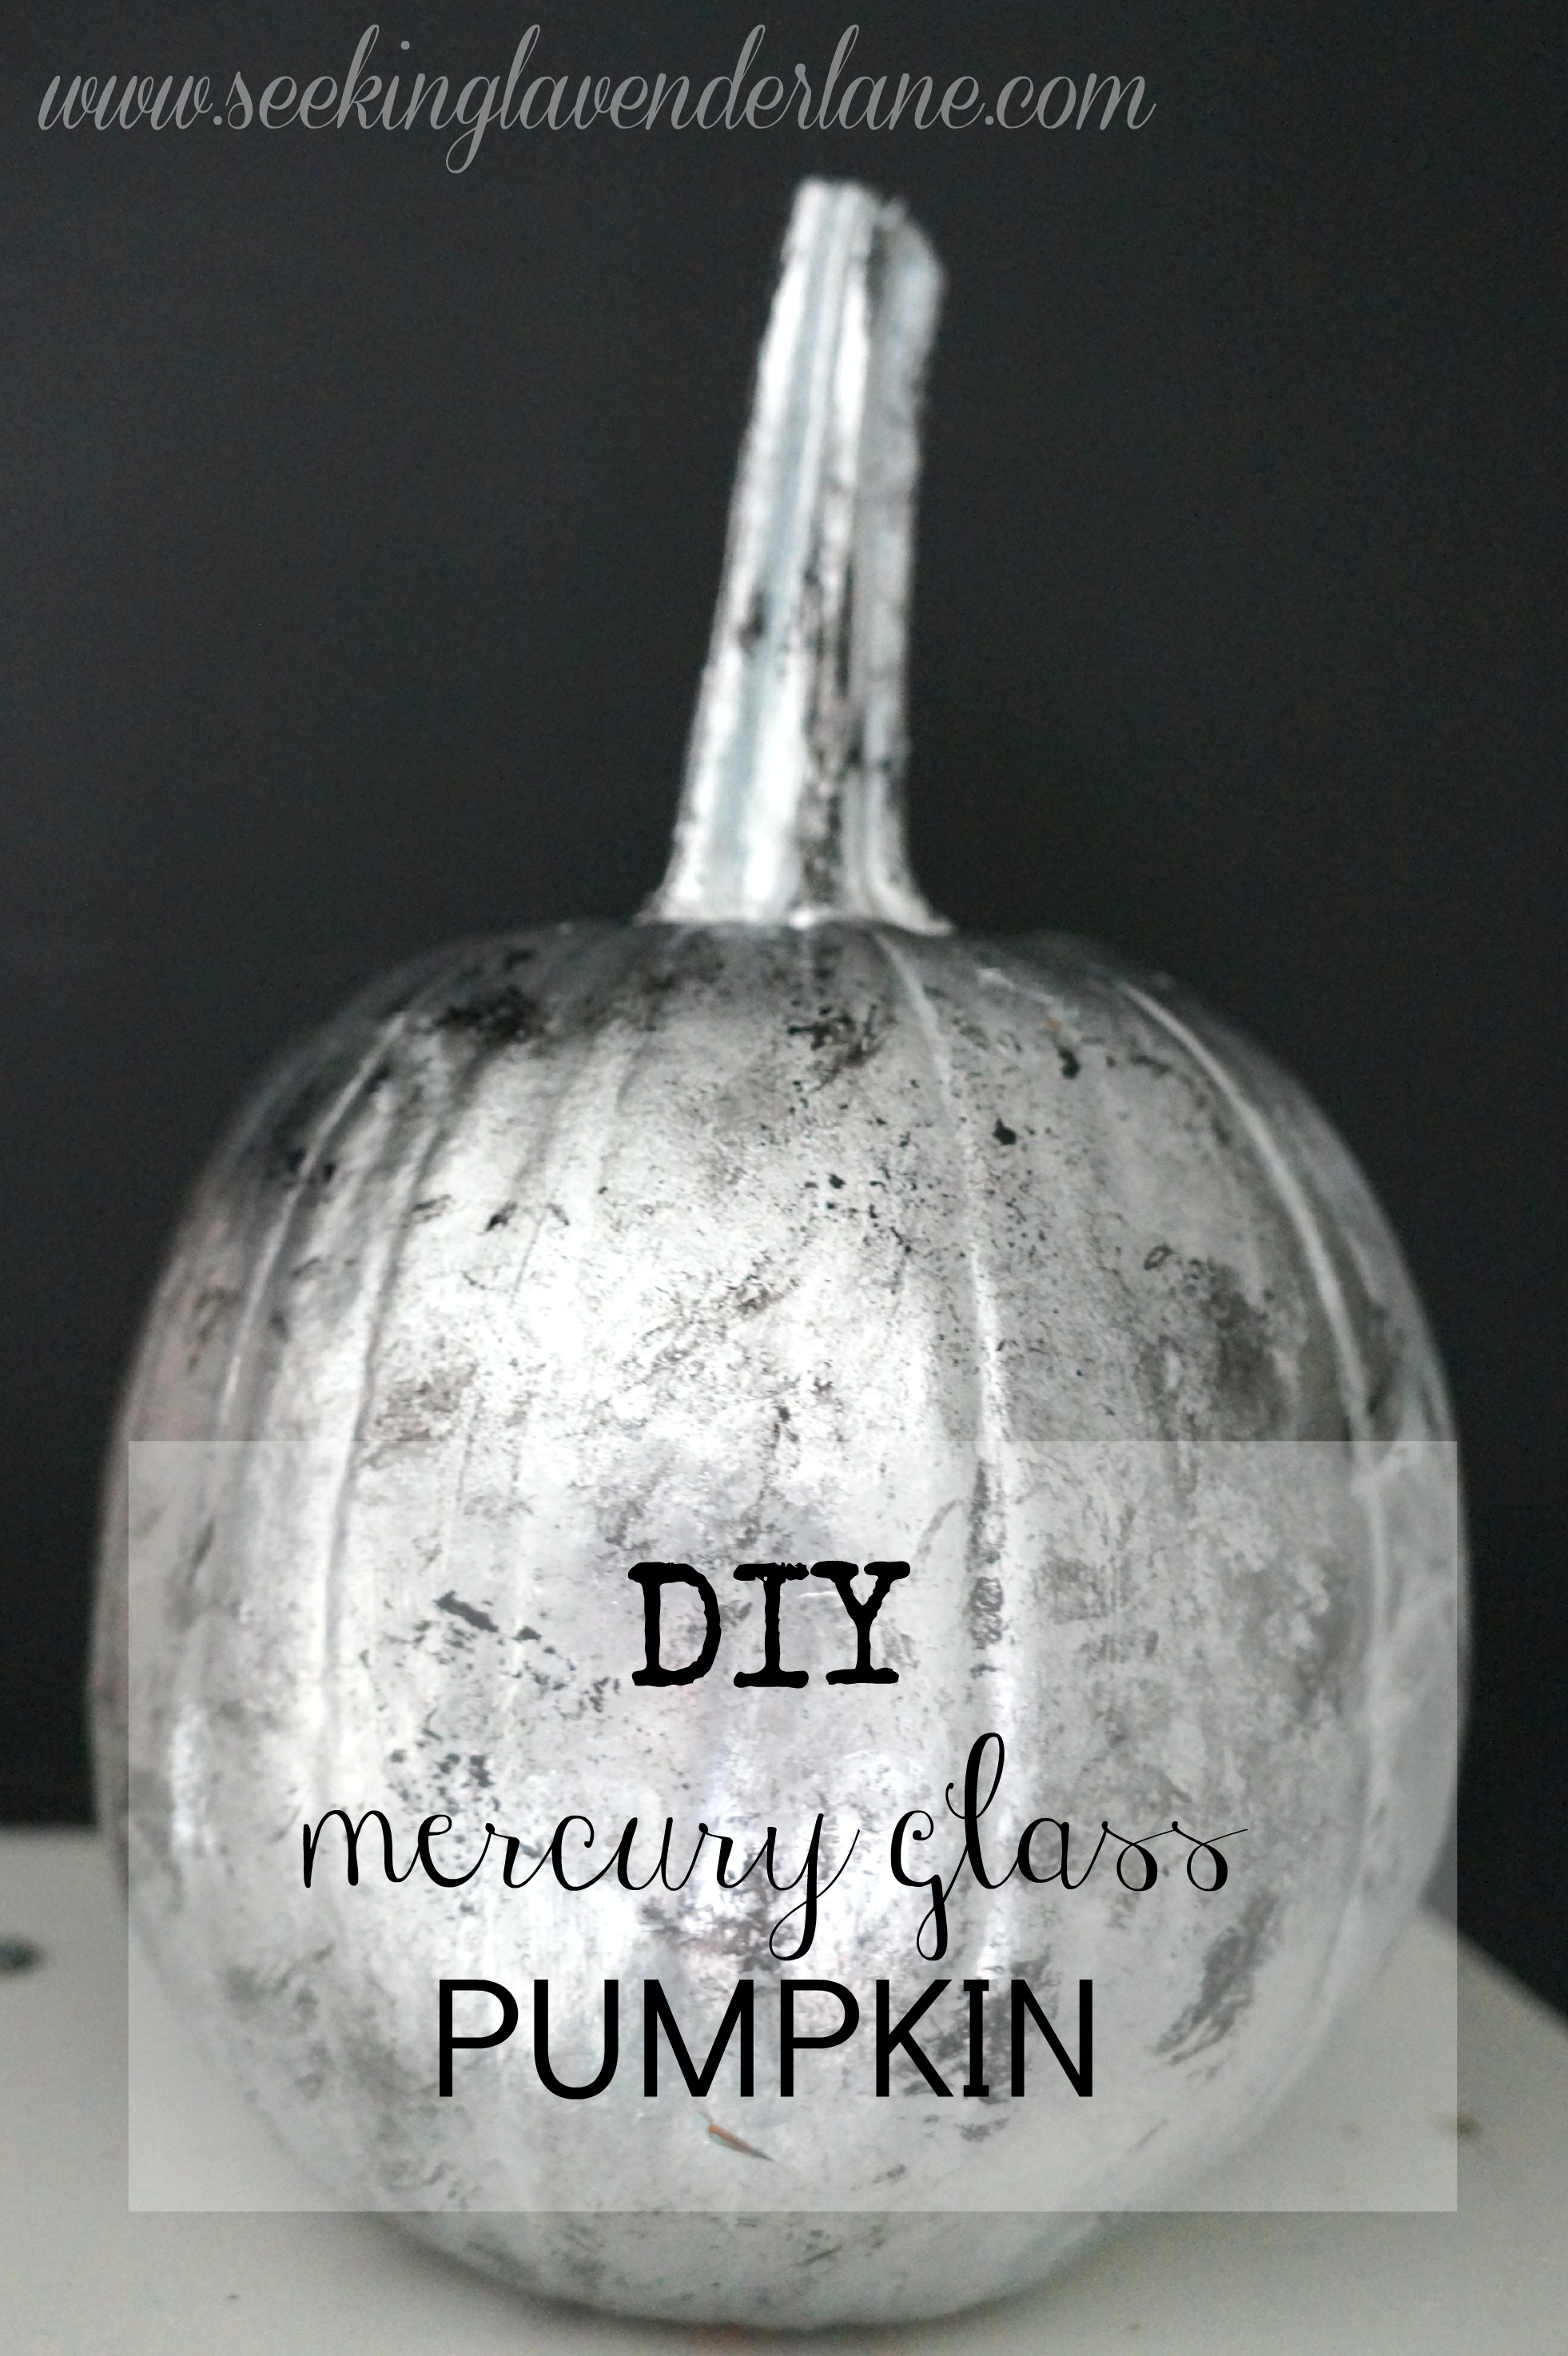 DIY Mercury Glass Pumpkin label